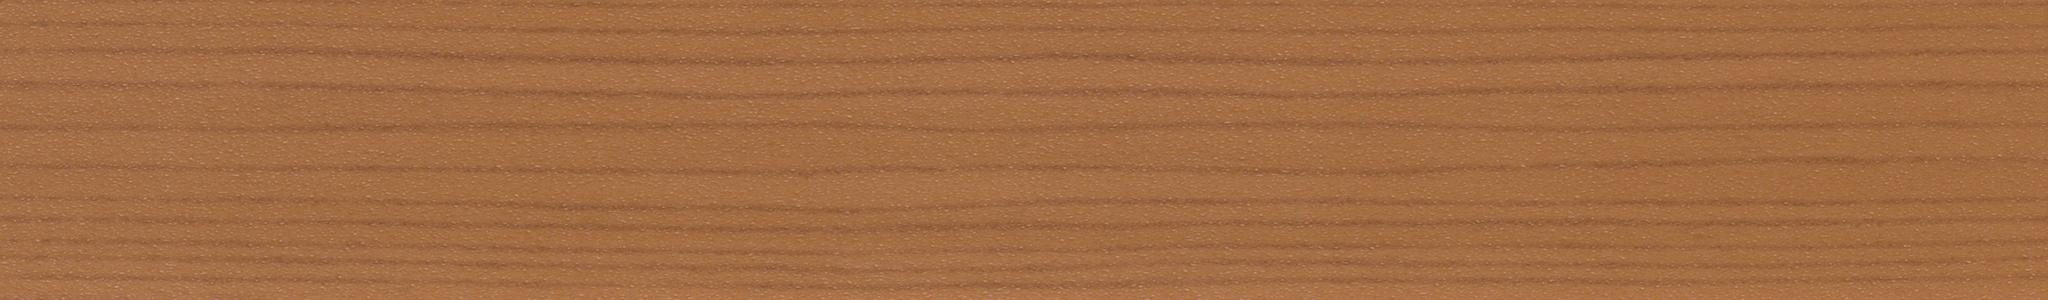 HD 229345 ABS hrana třešeň americká perla